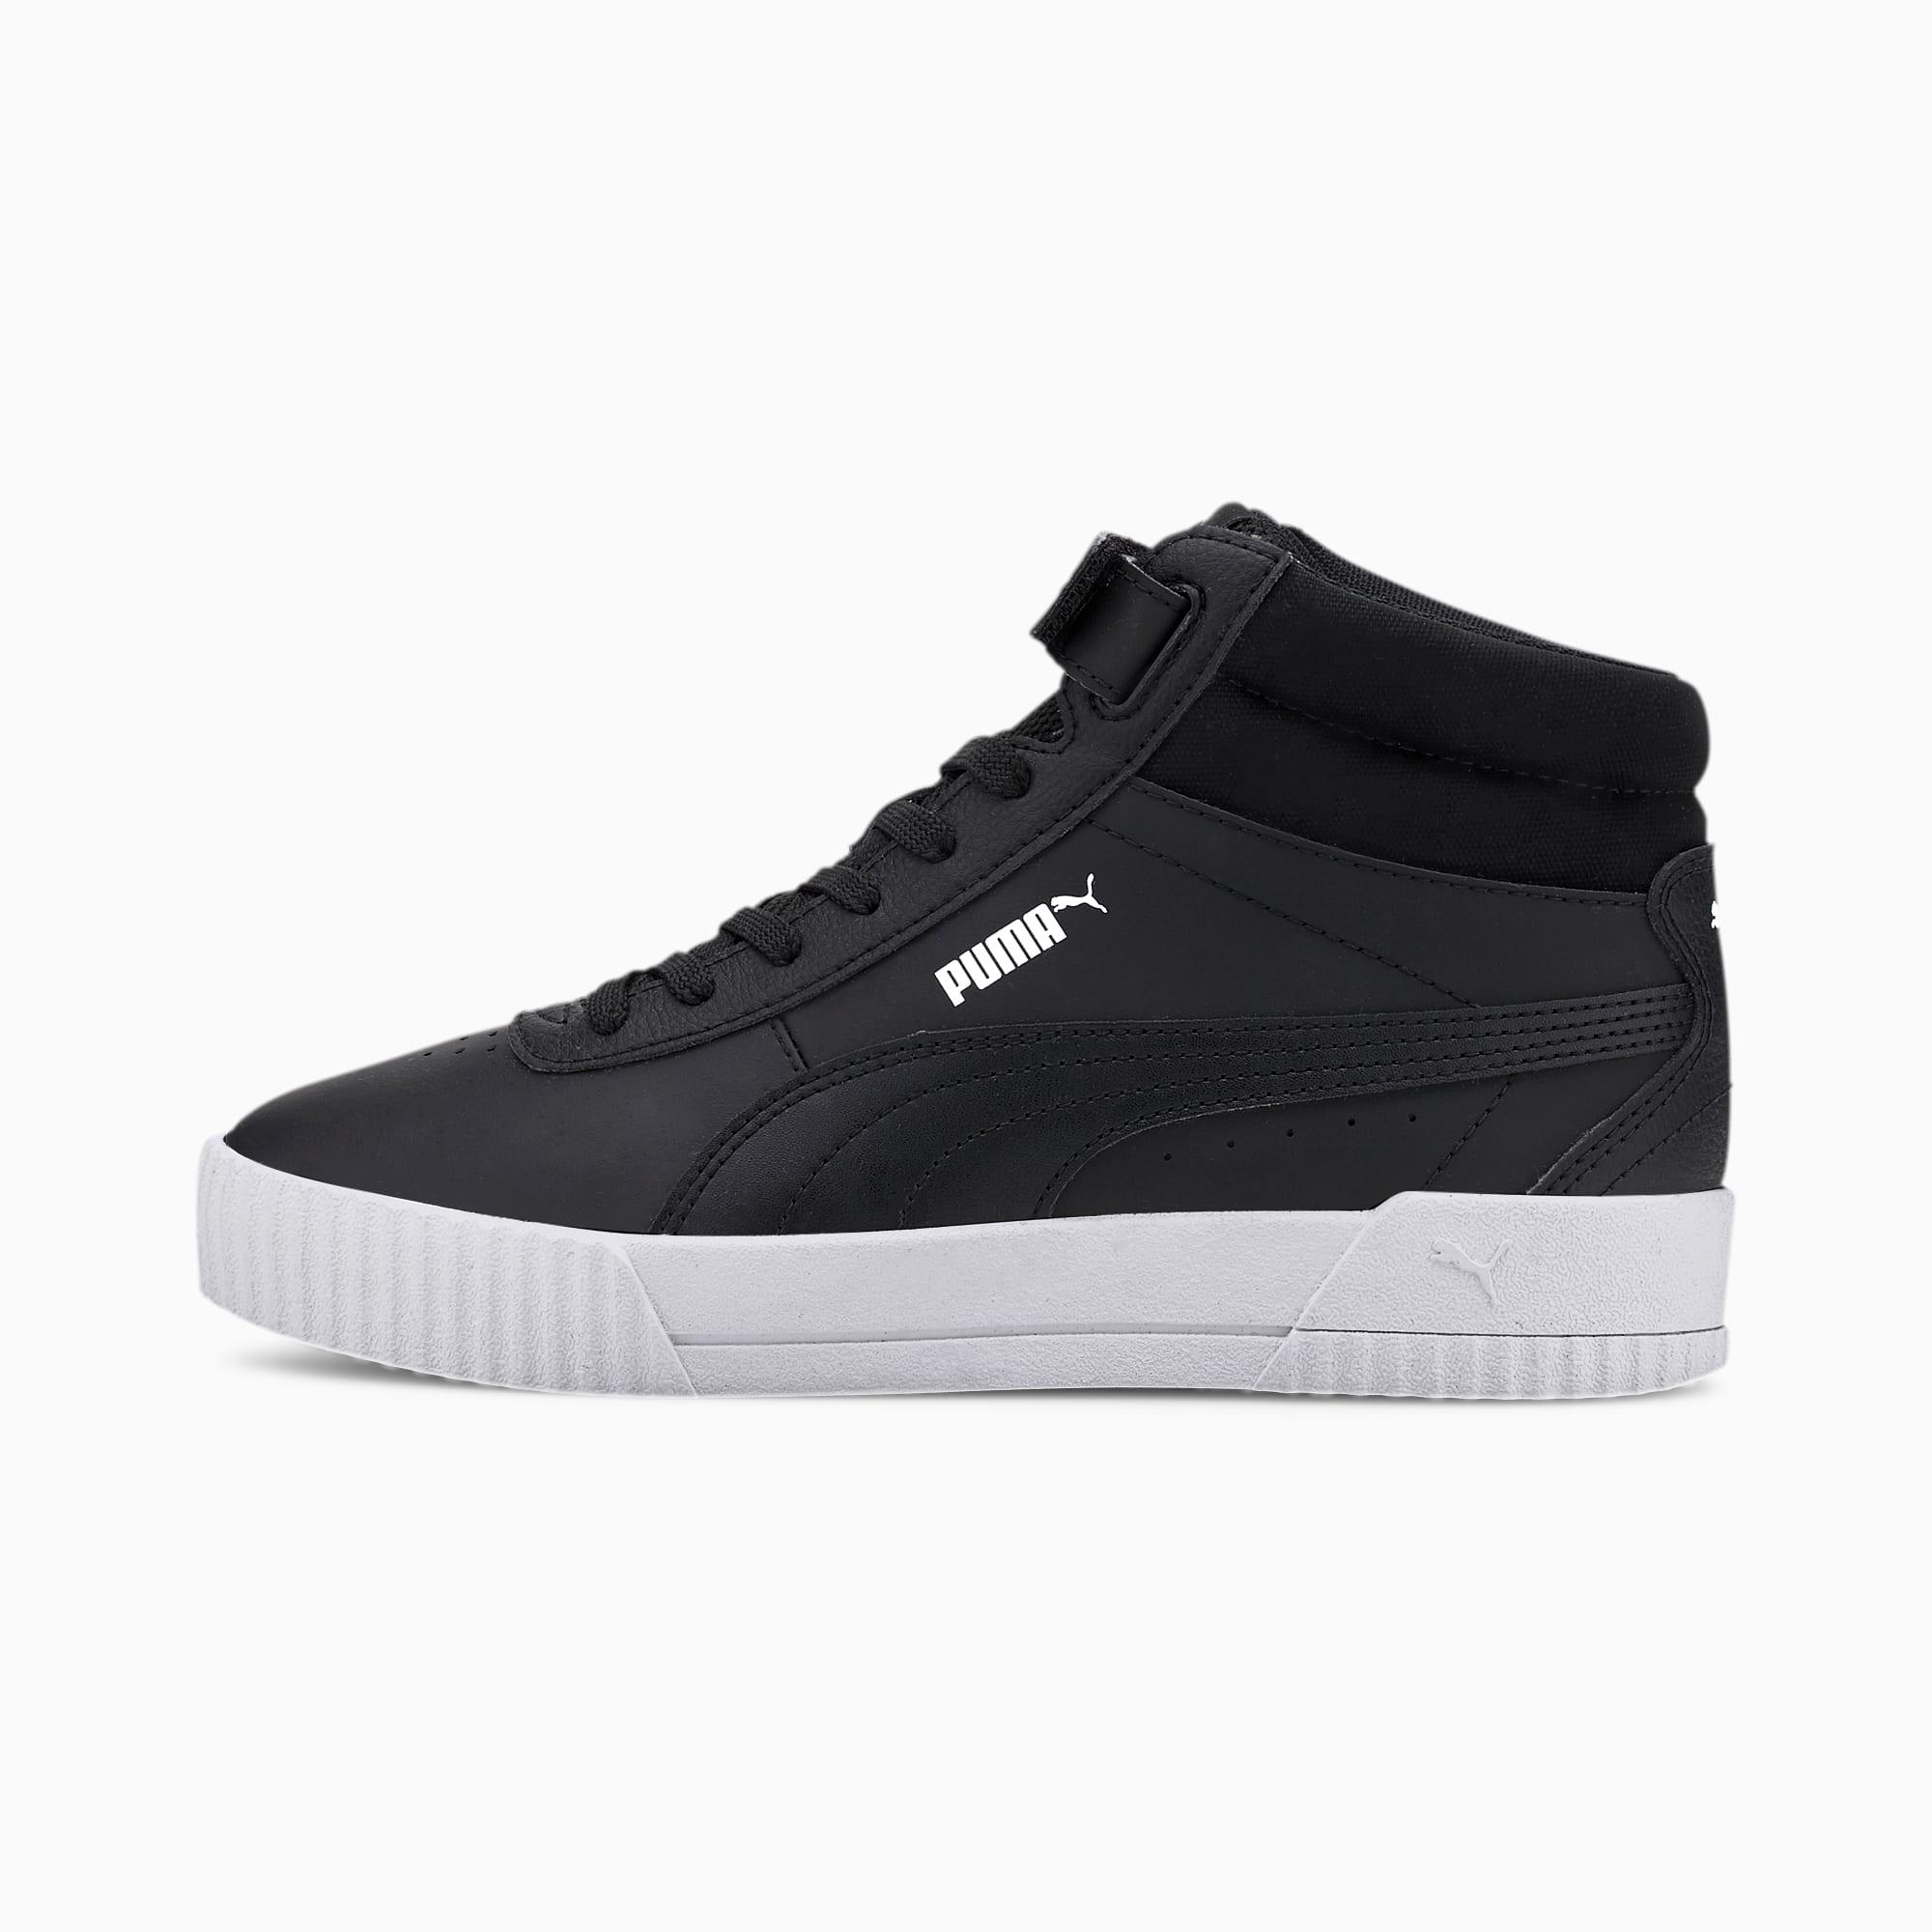 PUMA Chaussure Basket montante Carina femme, Noir, Taille 40, Chaussures